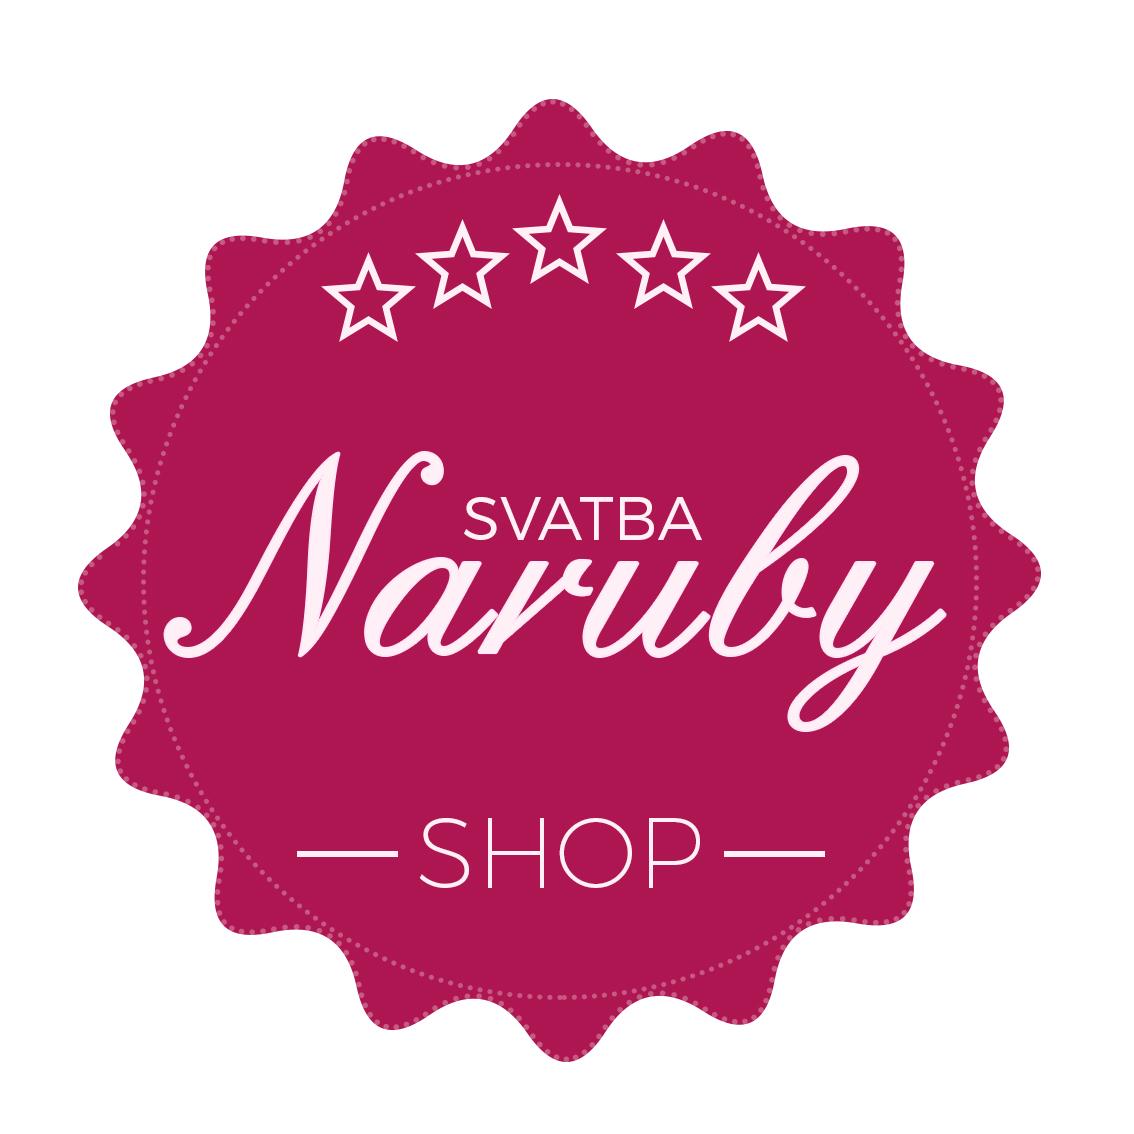 Logo-Svatba Naruby Shop